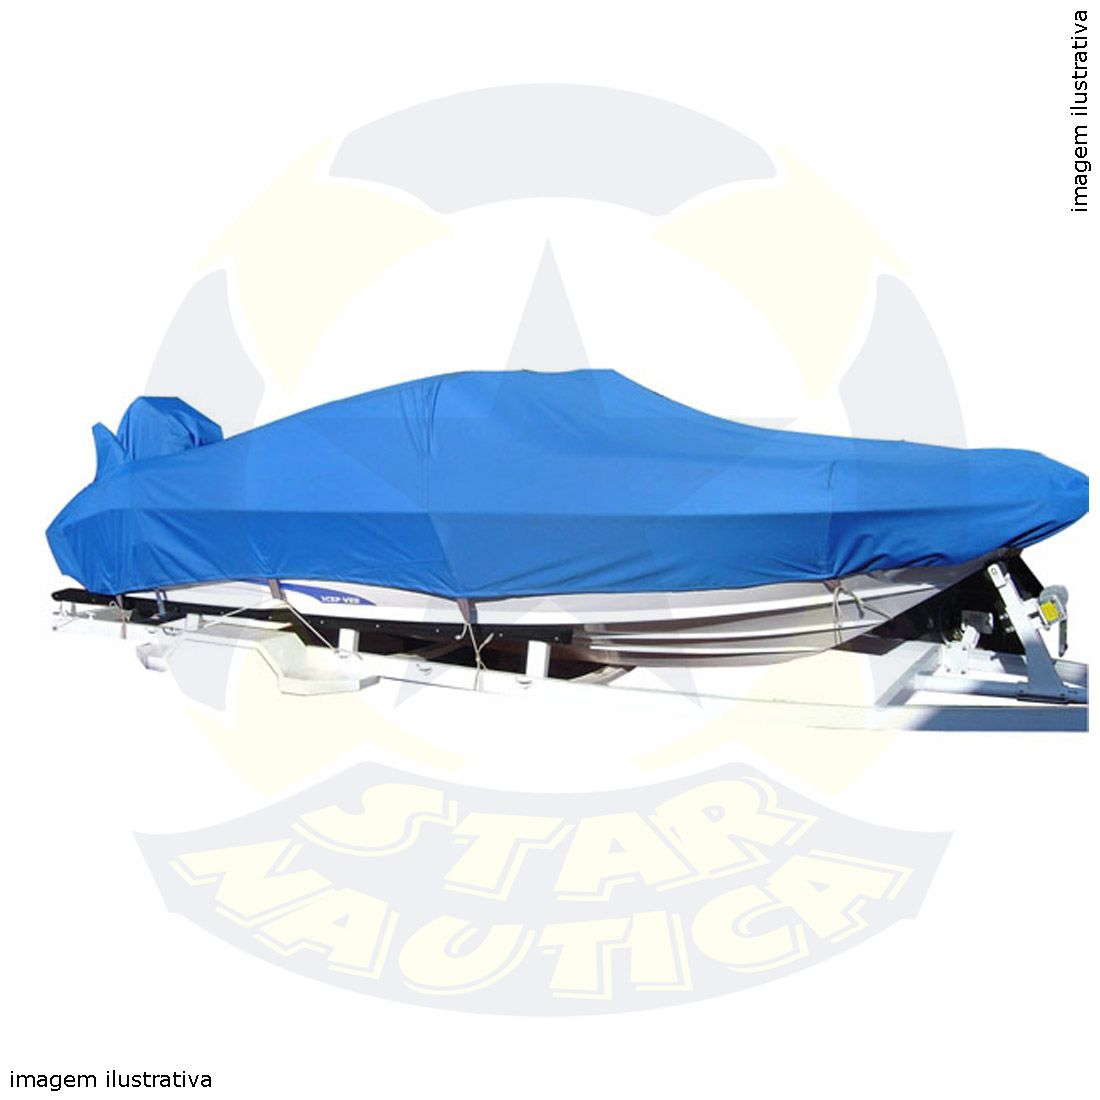 Capa Lona de Cobertura Lancha Focker 230 Lona Vinílica